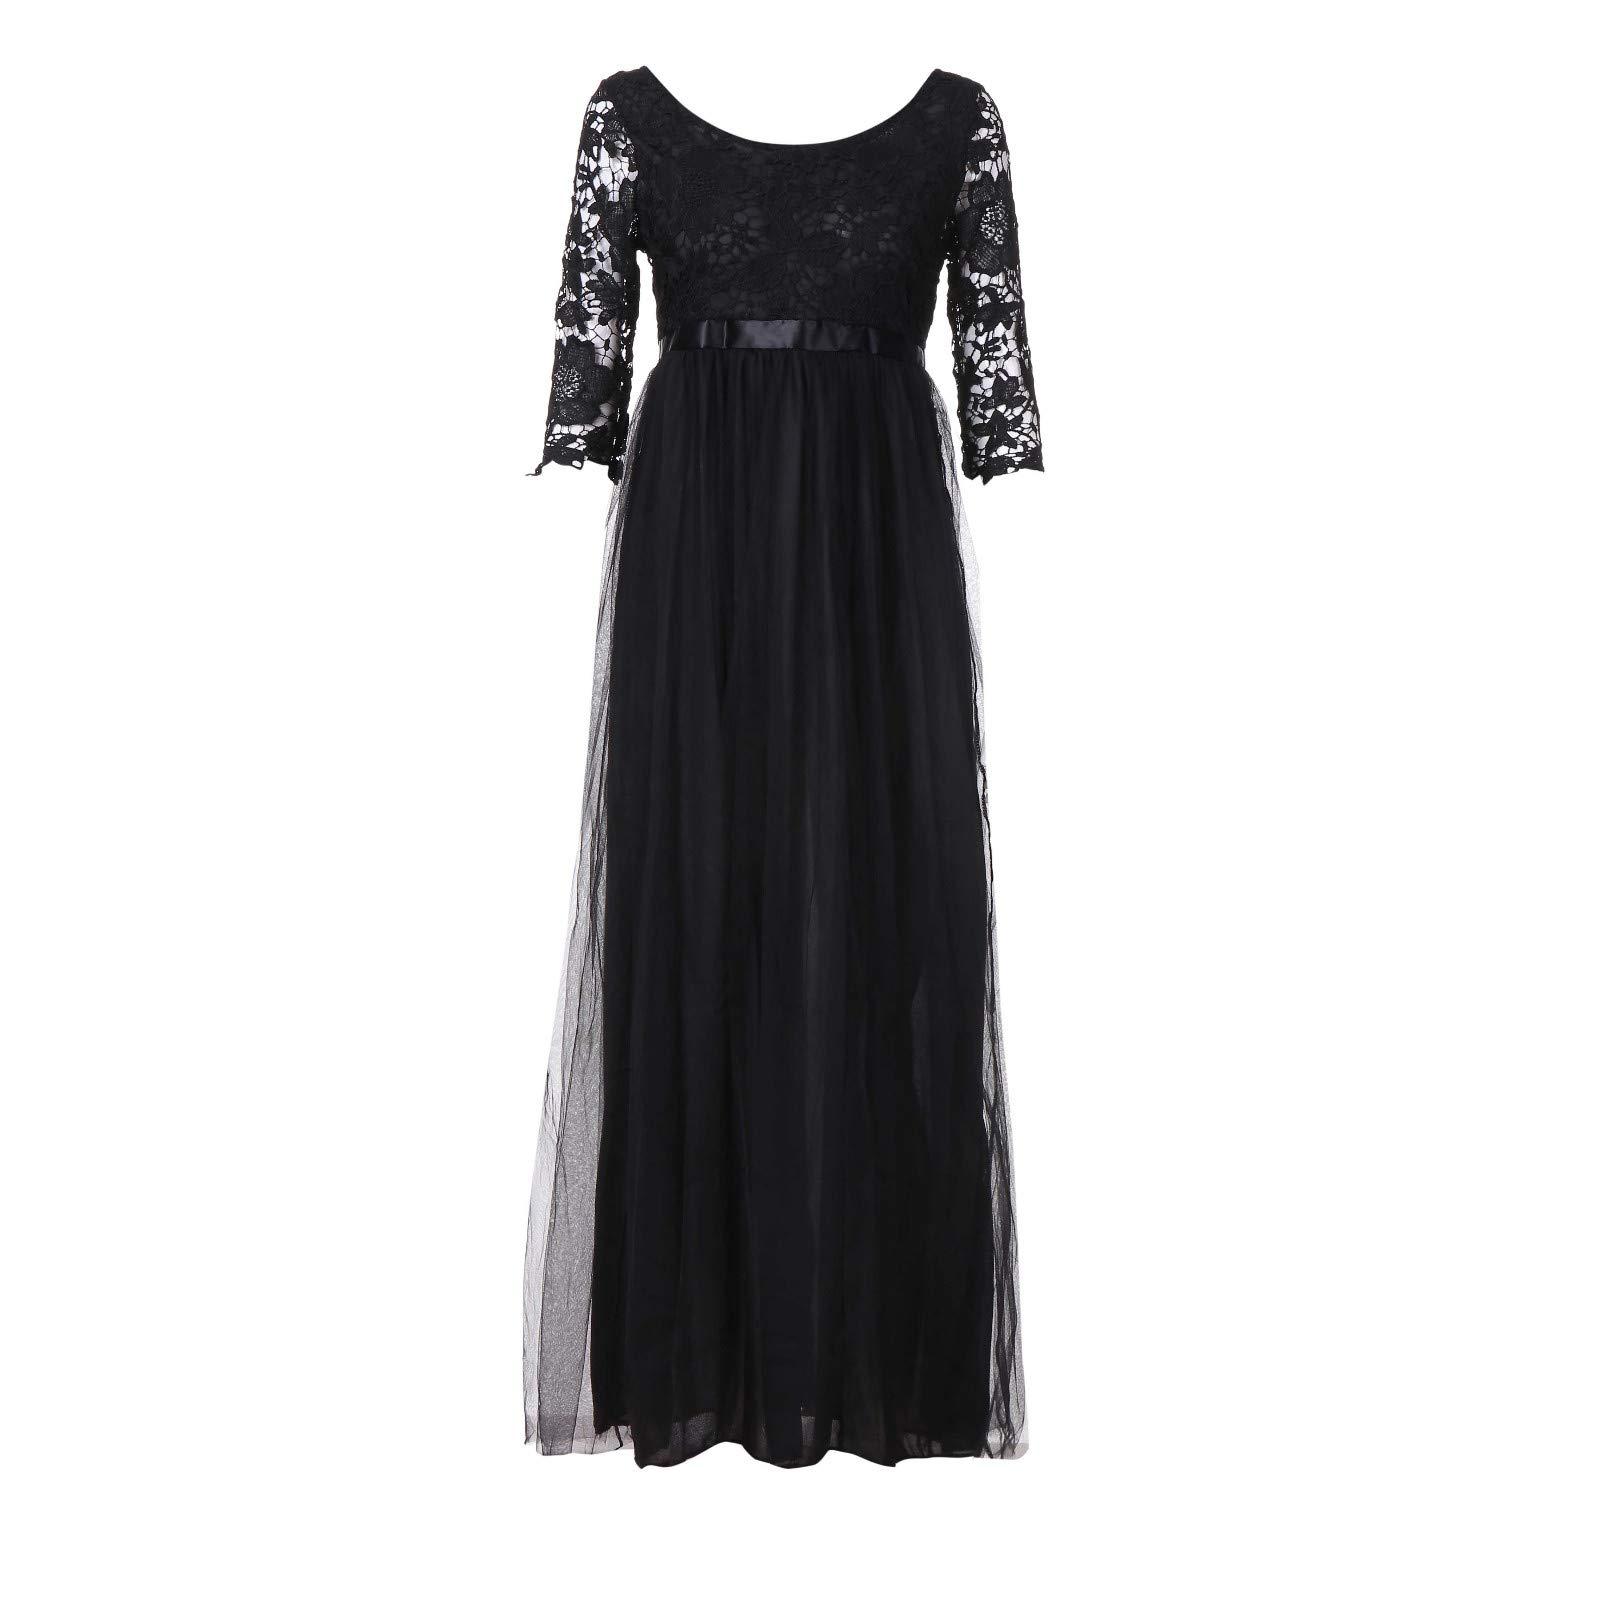 Littleice Women Chiffon Lace Bridesmaid Long Maxi Dress Evening Prom Gown Lace Dresses (Black, XL)